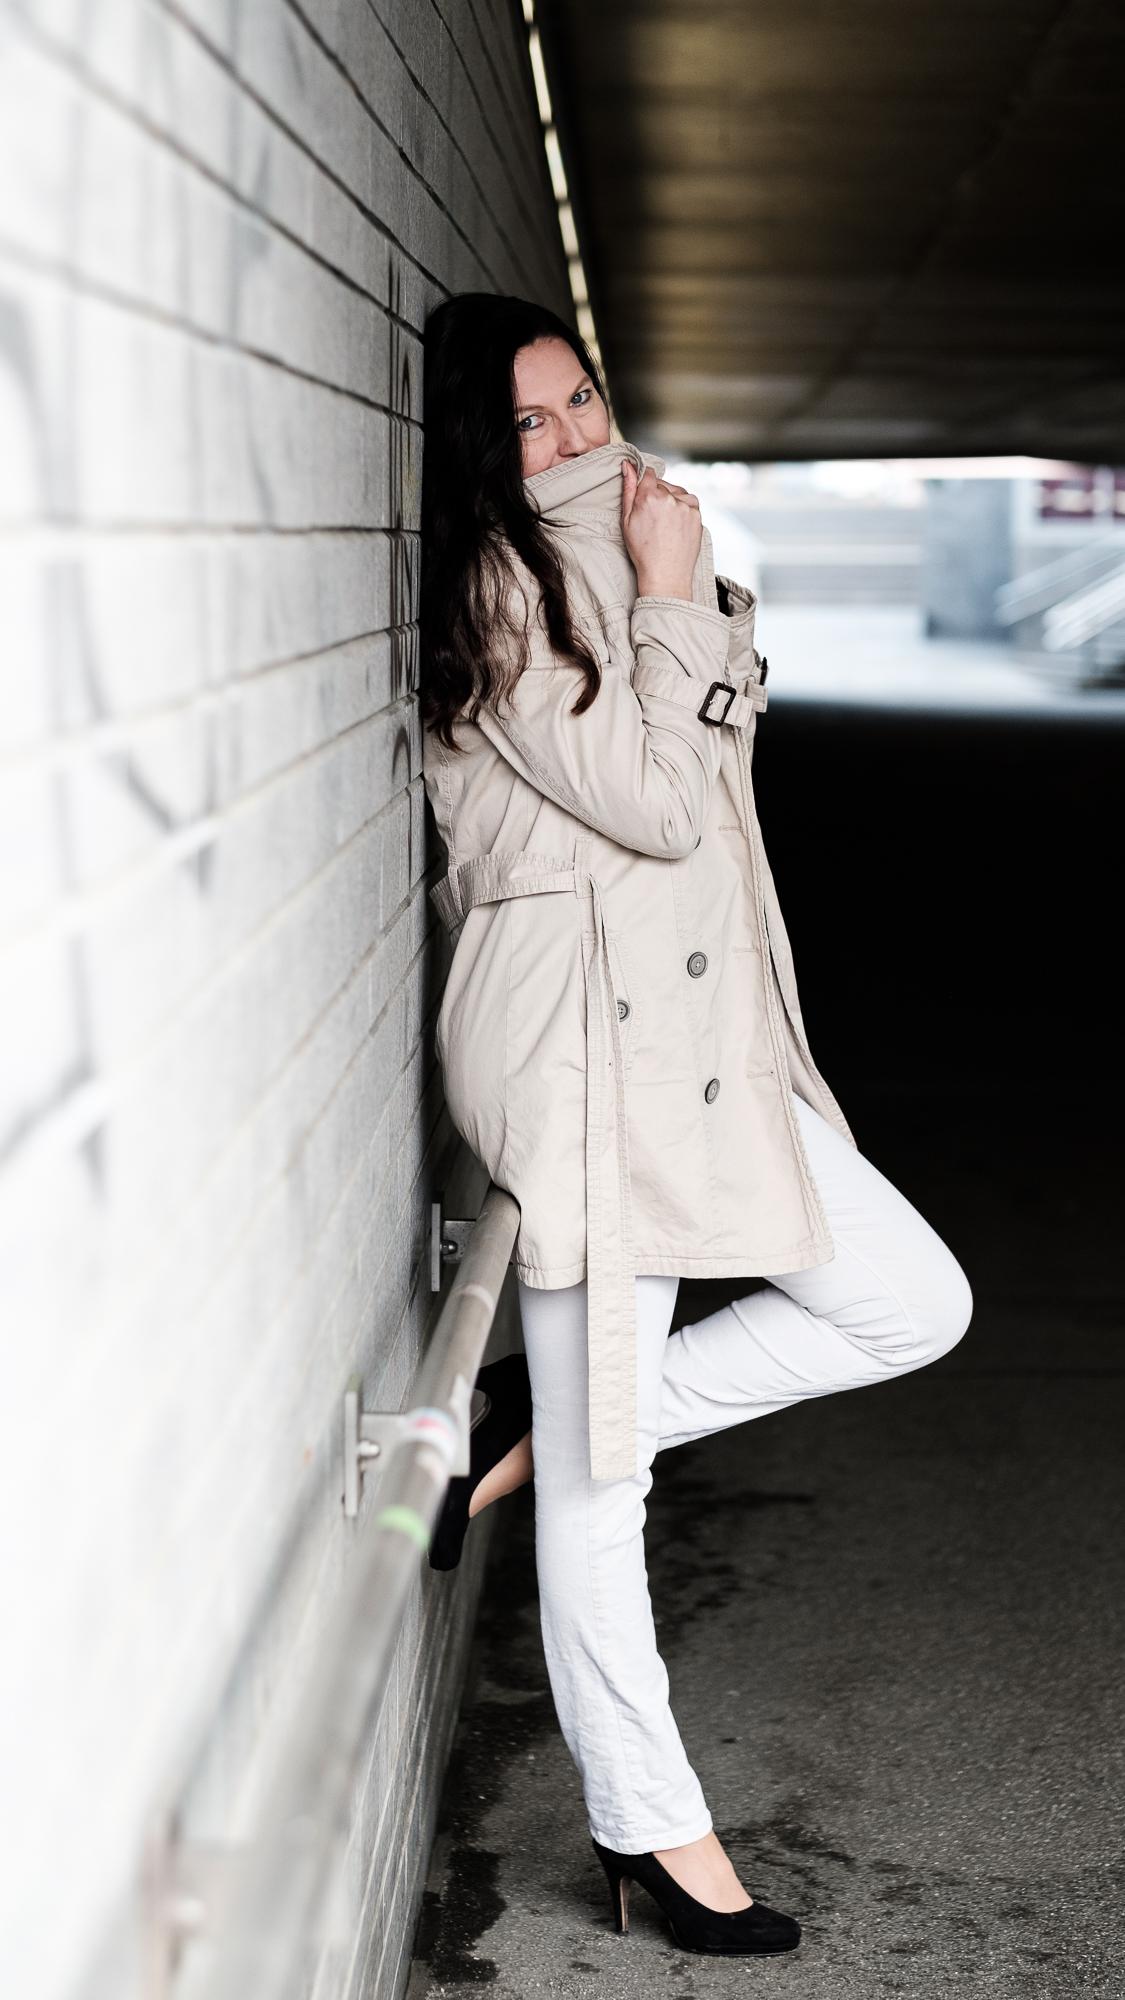 2019_04_Stationshoot_Christina_creazyfoto-0967